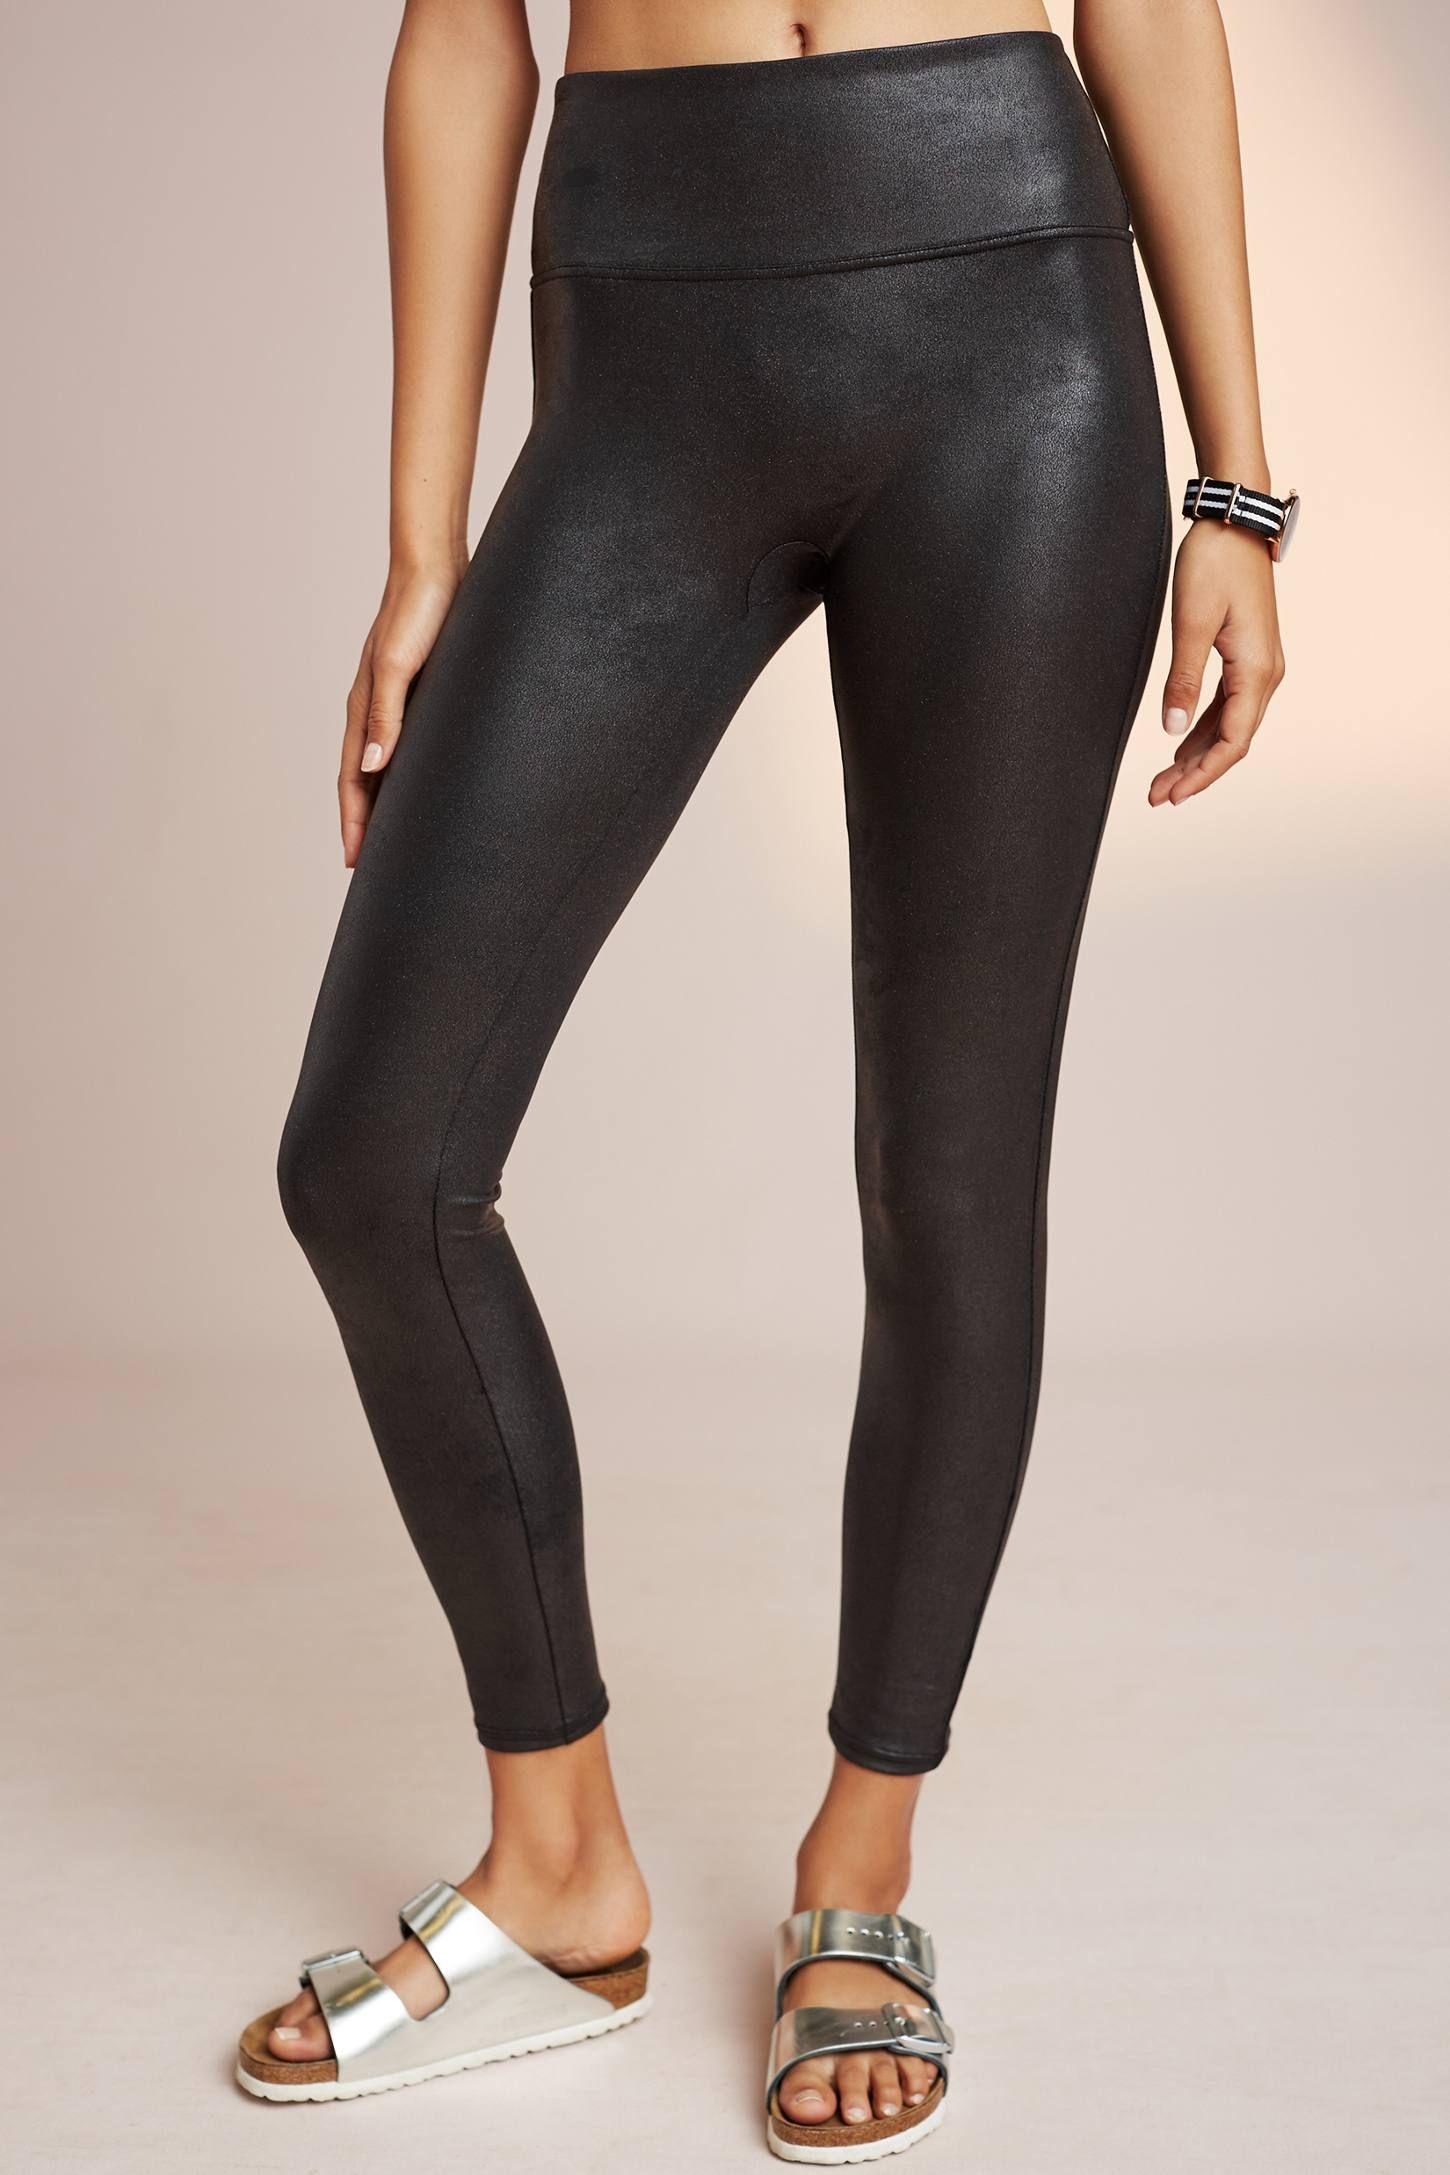 6ea56e2f4febe Spanx Faux Leather Leggings | Fall Shopping List - Dark Winter ...